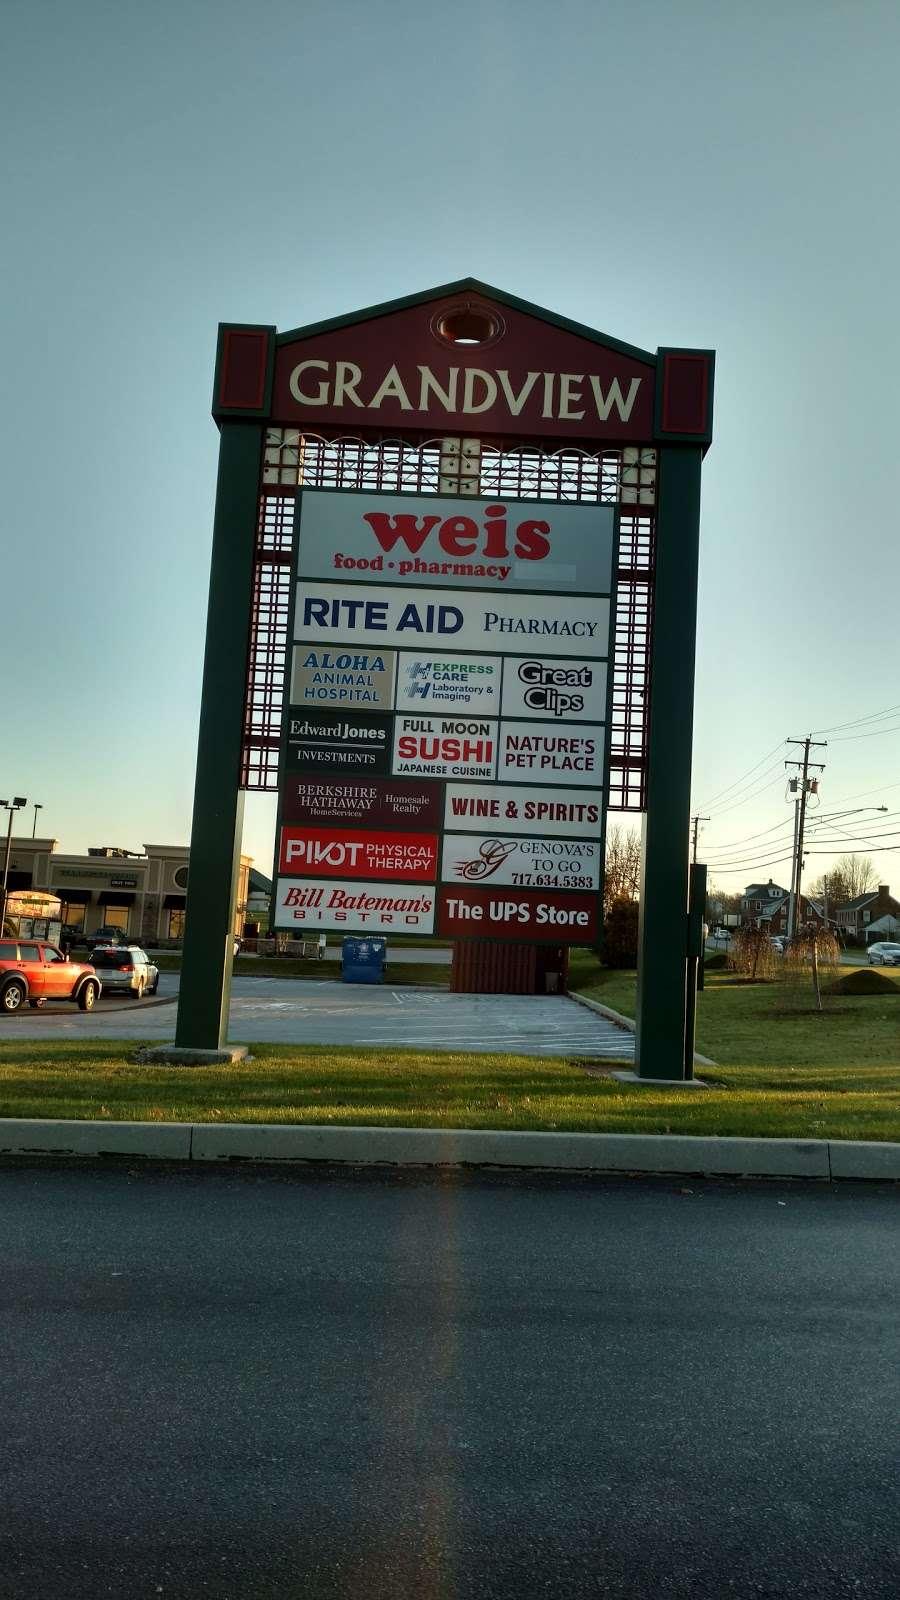 Grandview Plaza - shopping mall  | Photo 1 of 3 | Address: 1424 Baltimore St, Hanover, PA 17331, USA